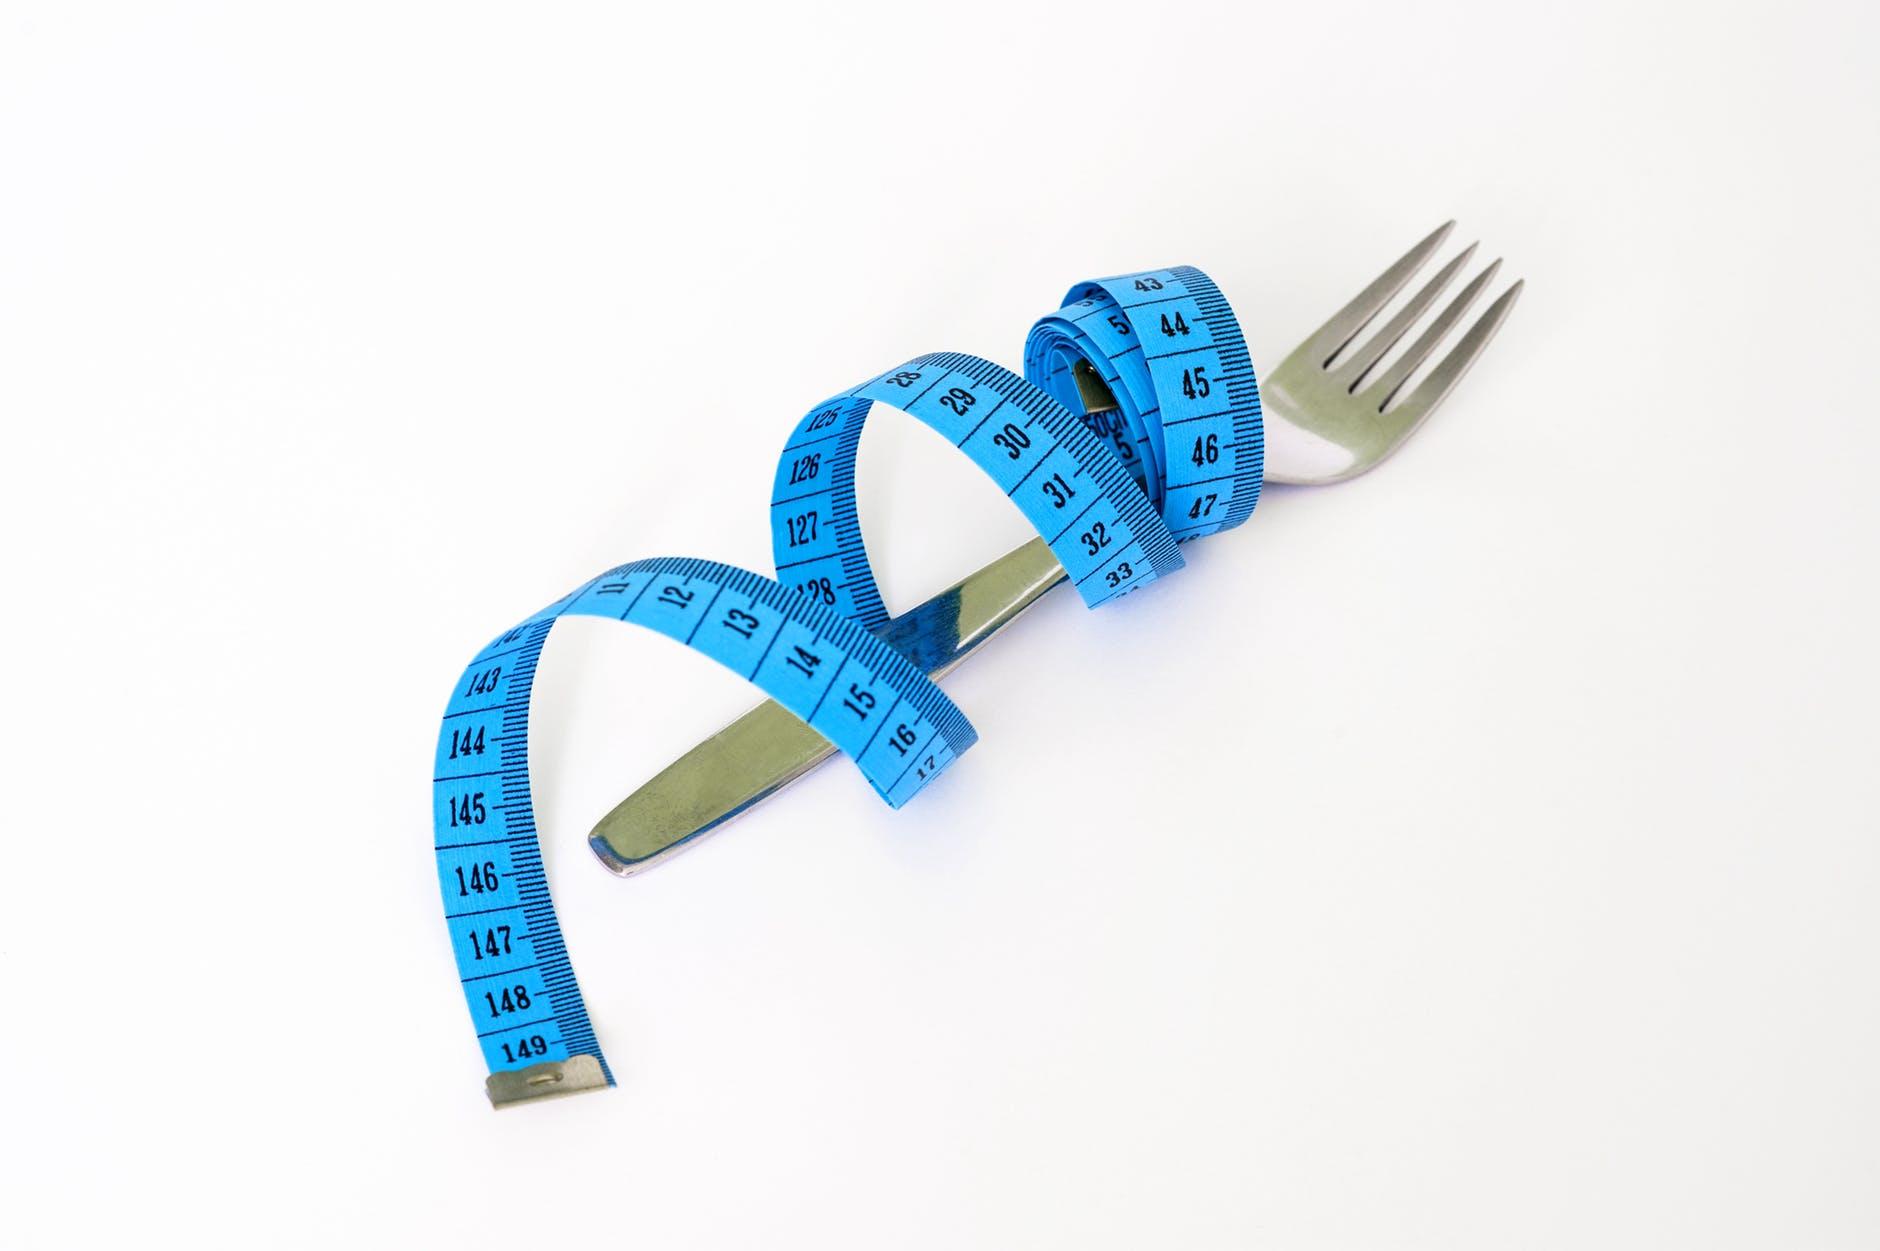 Diätplan 500 Kalorien pro Tag schnell abnehmen